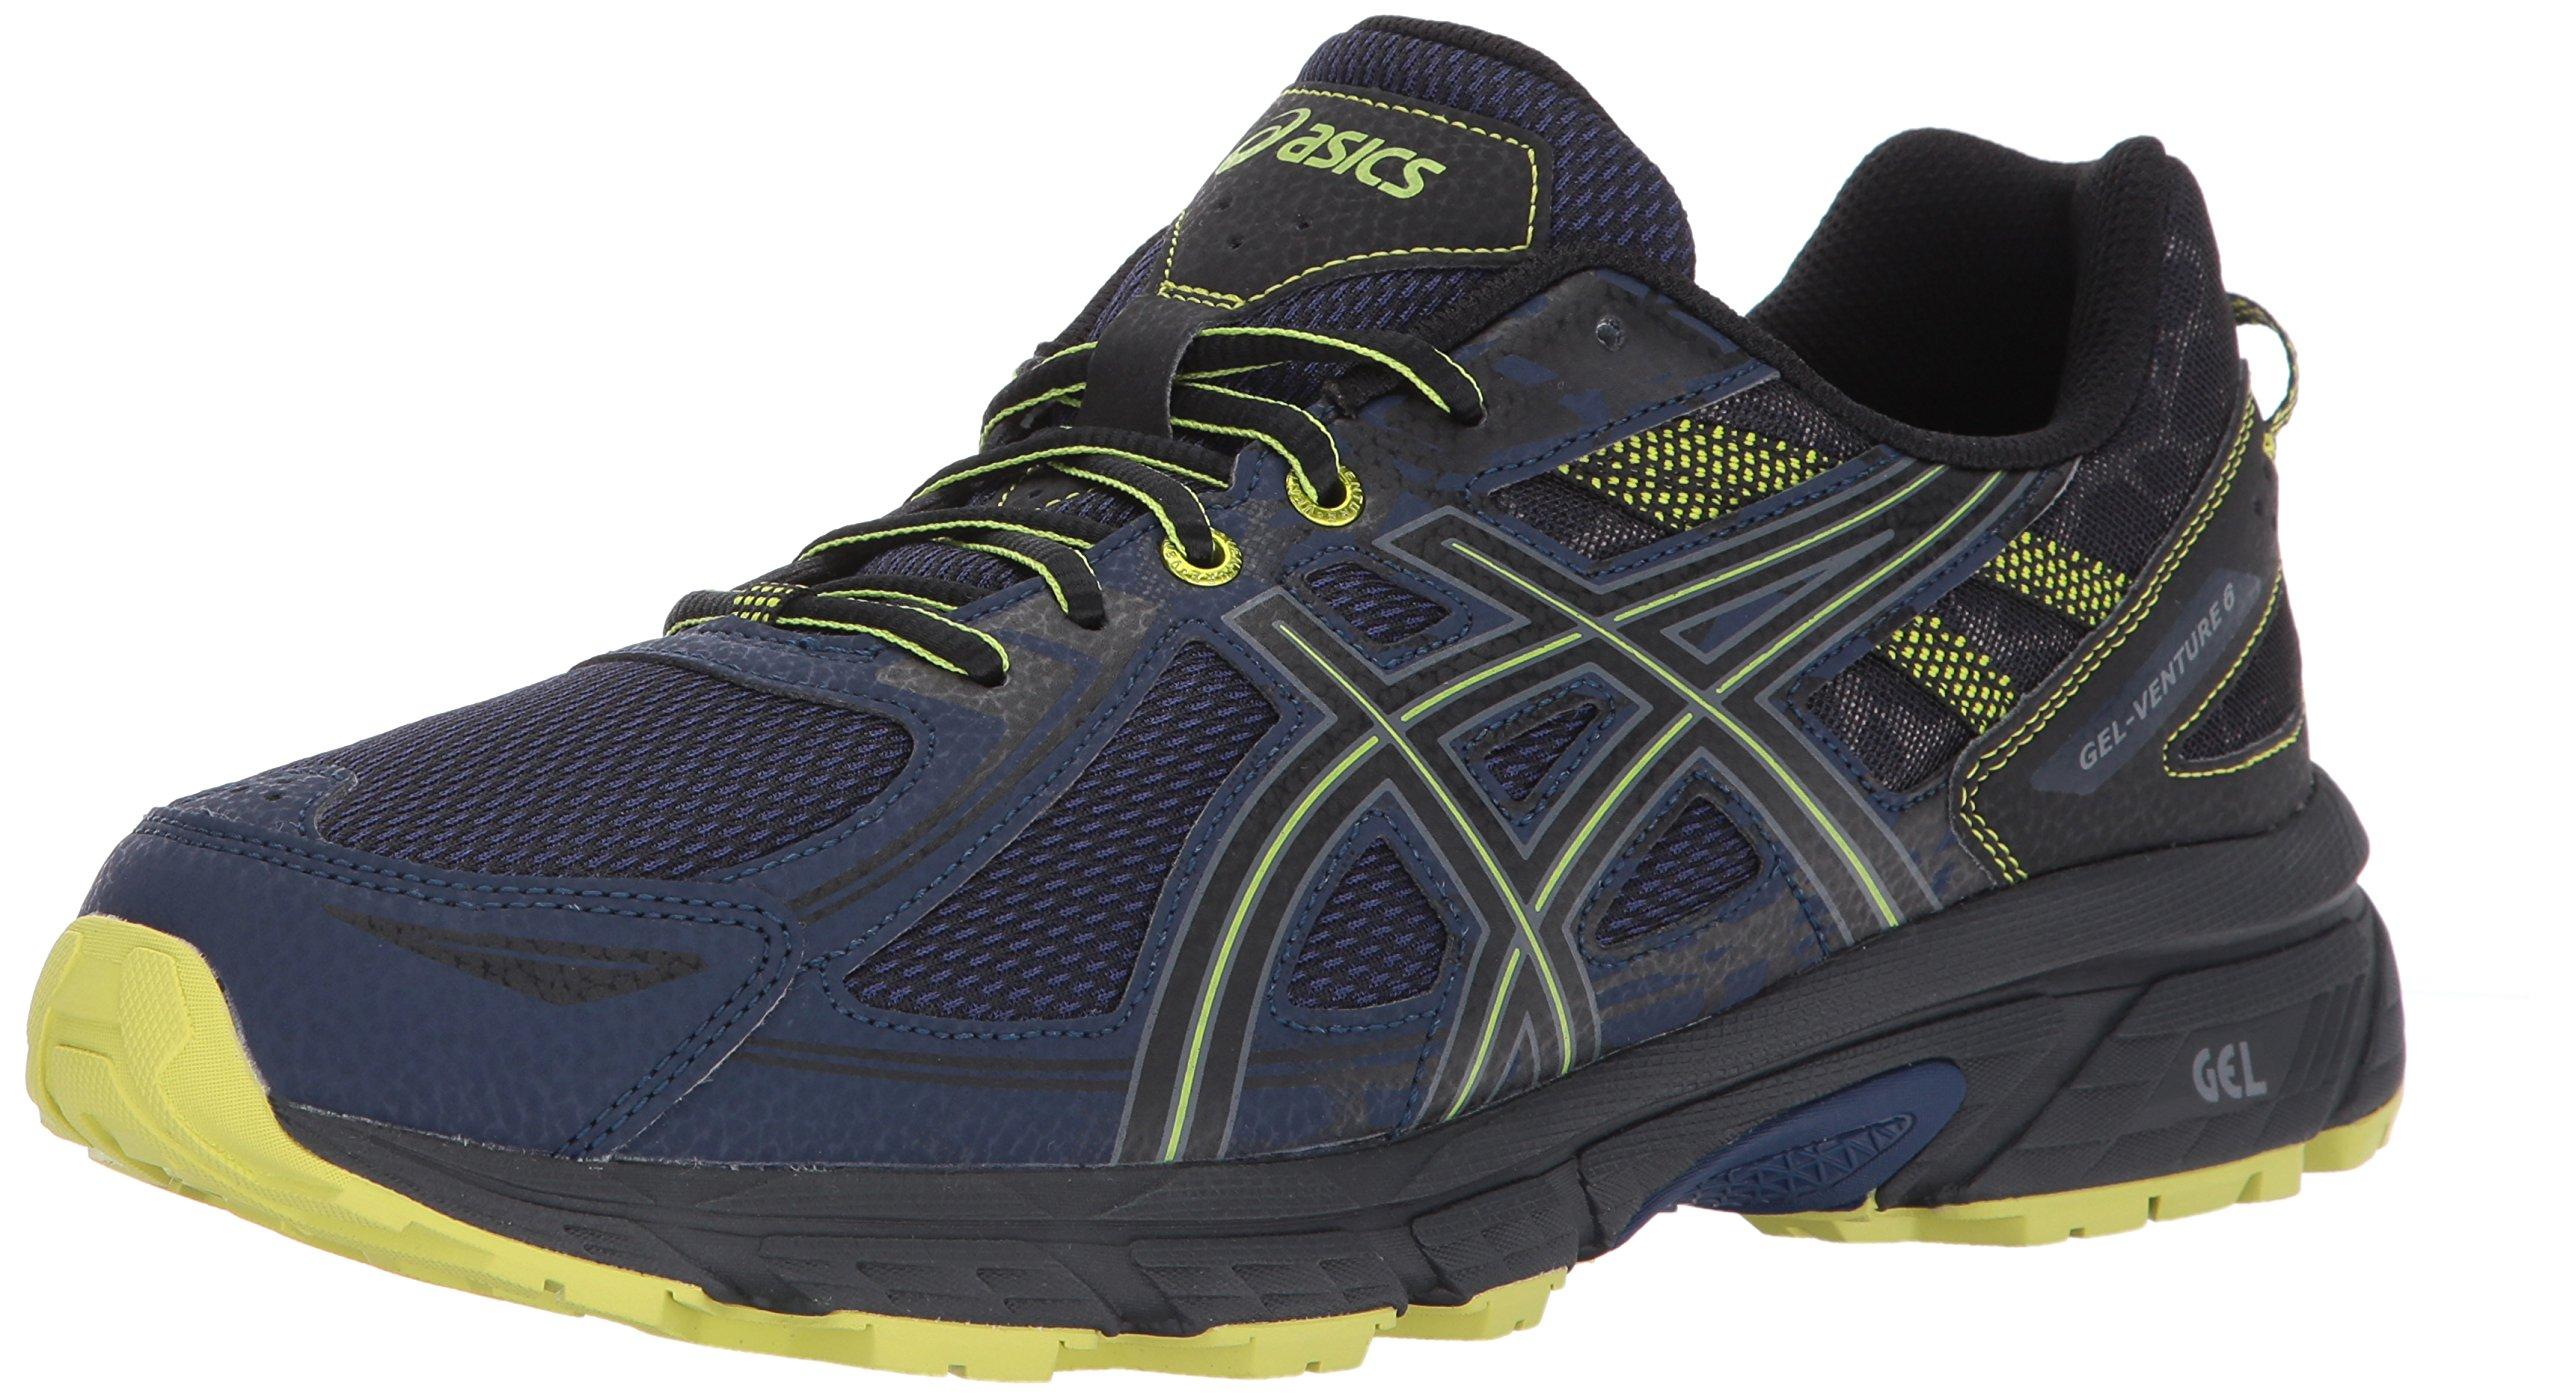 ASICS Mens Gel-Venture 6 Running Shoe Indigo Blue/Black/Energy Green 11 4E US